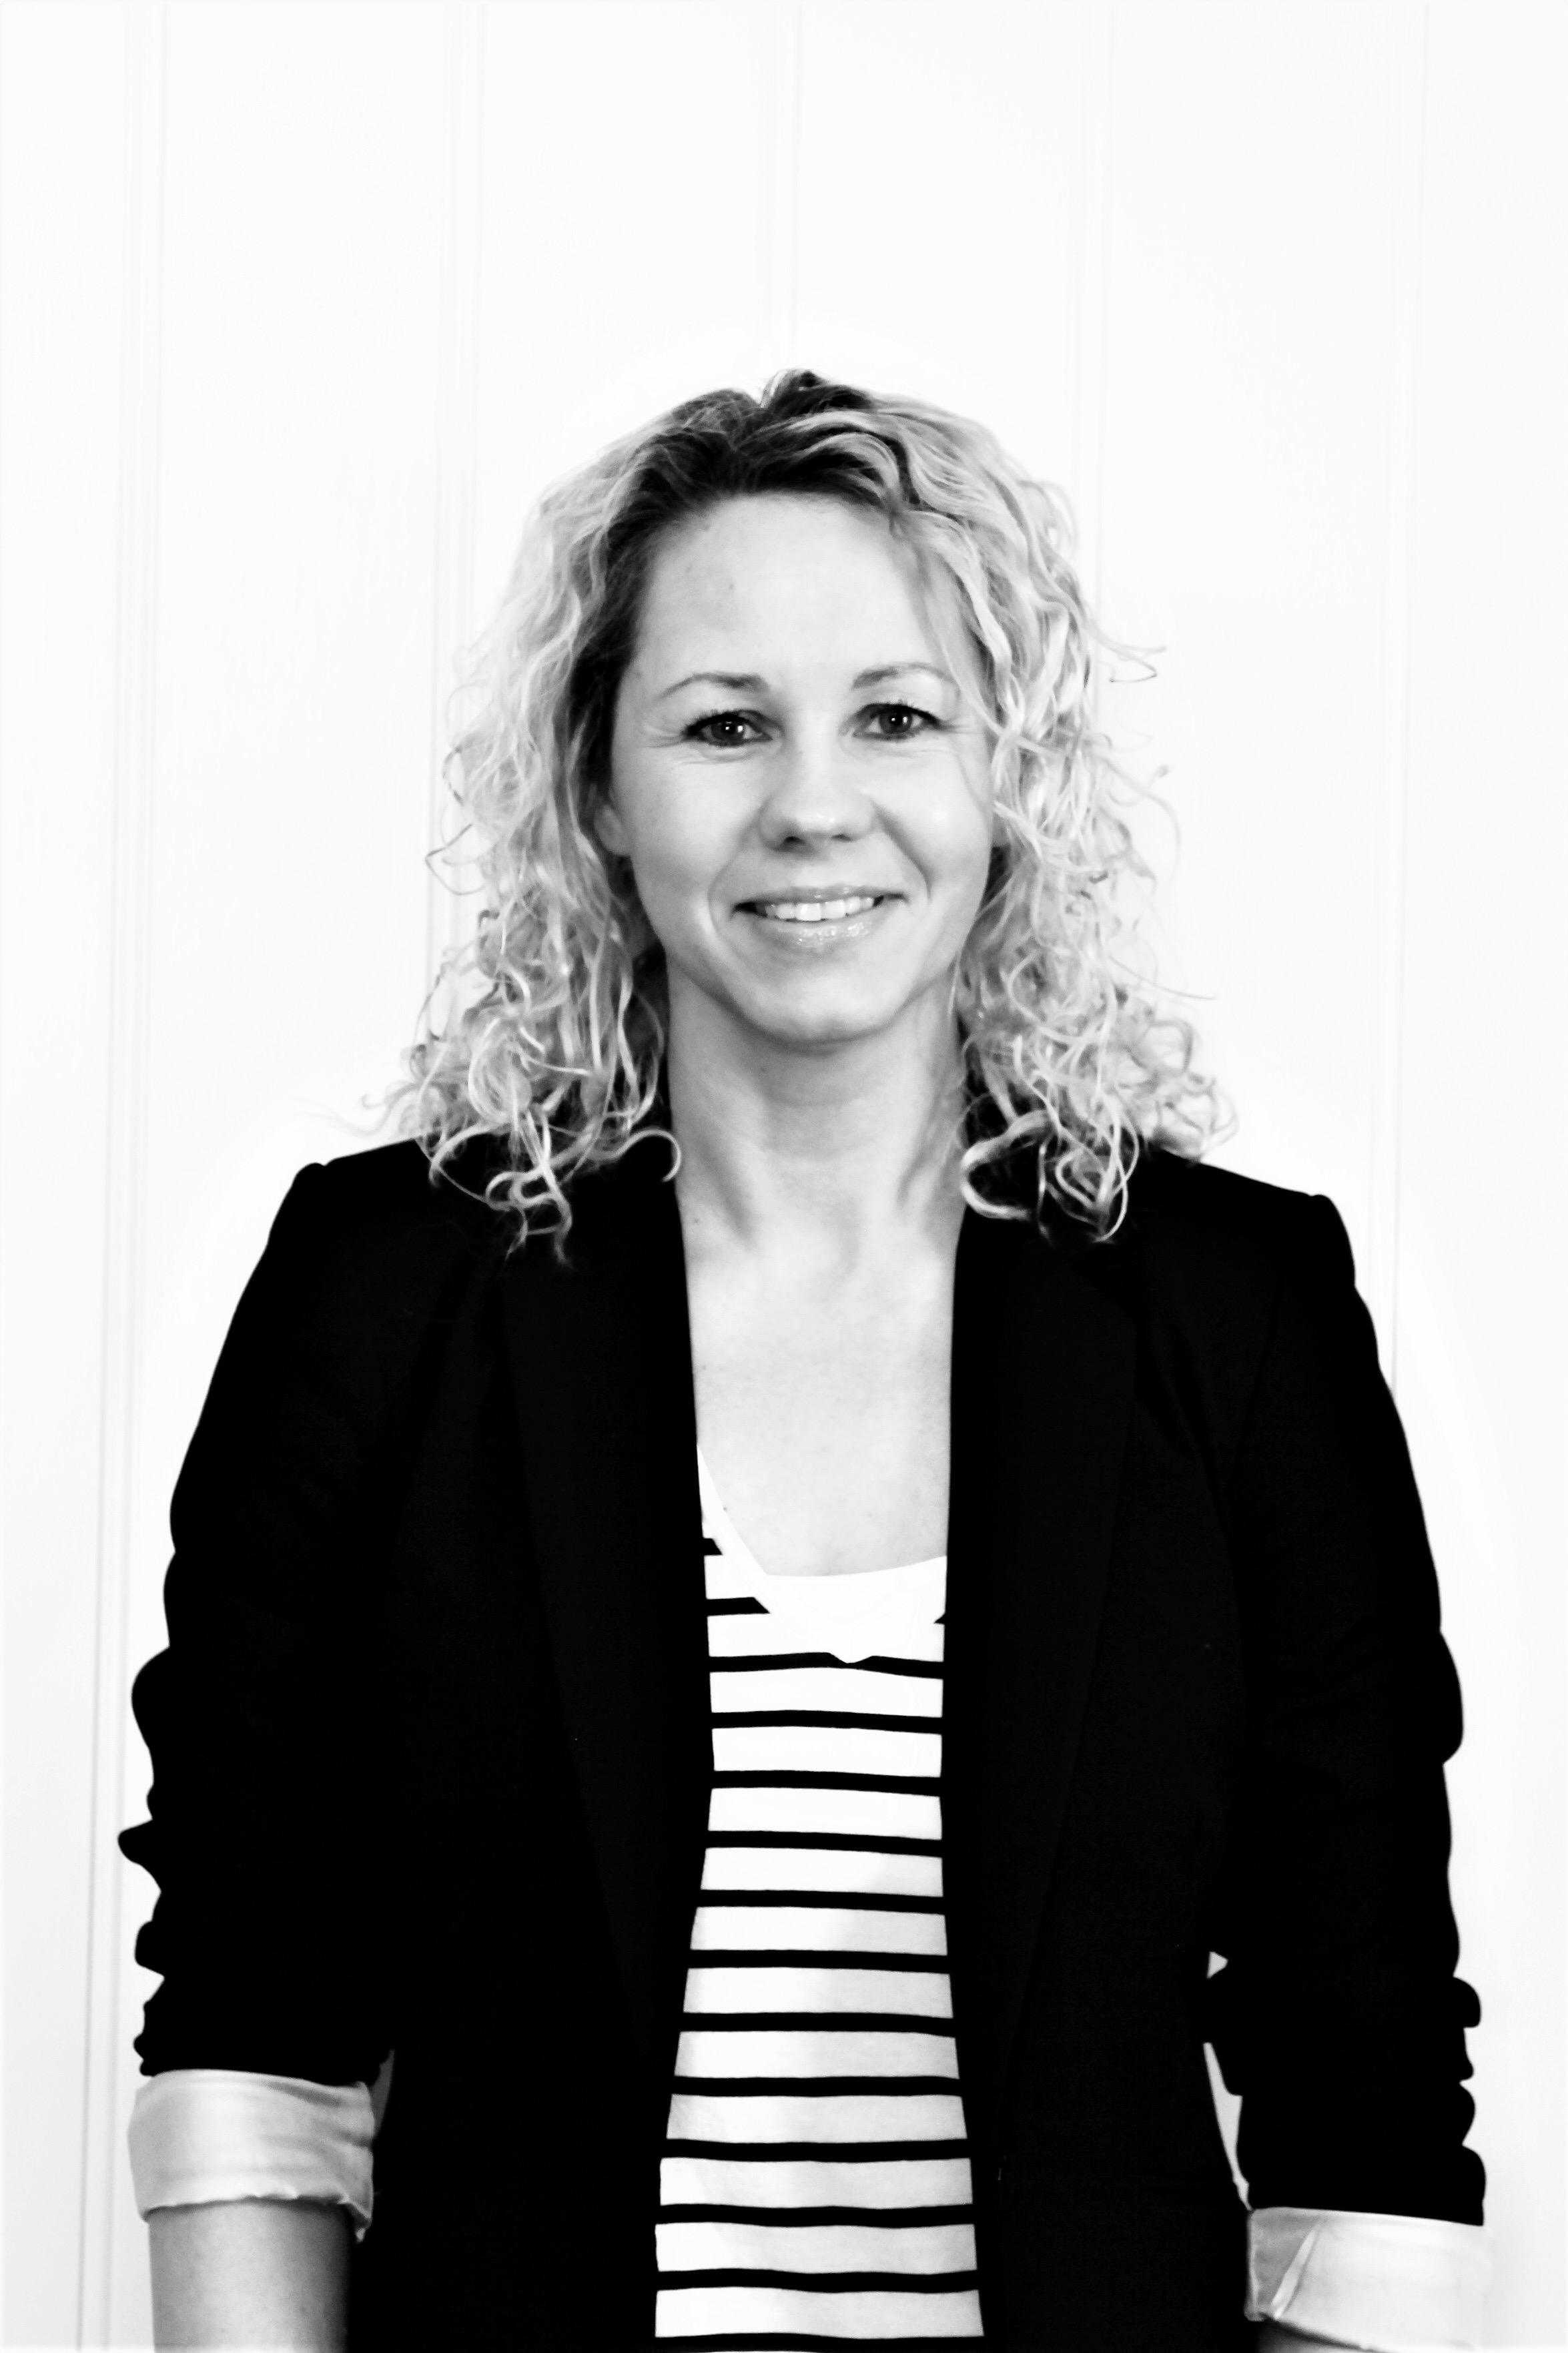 Monica Knedal